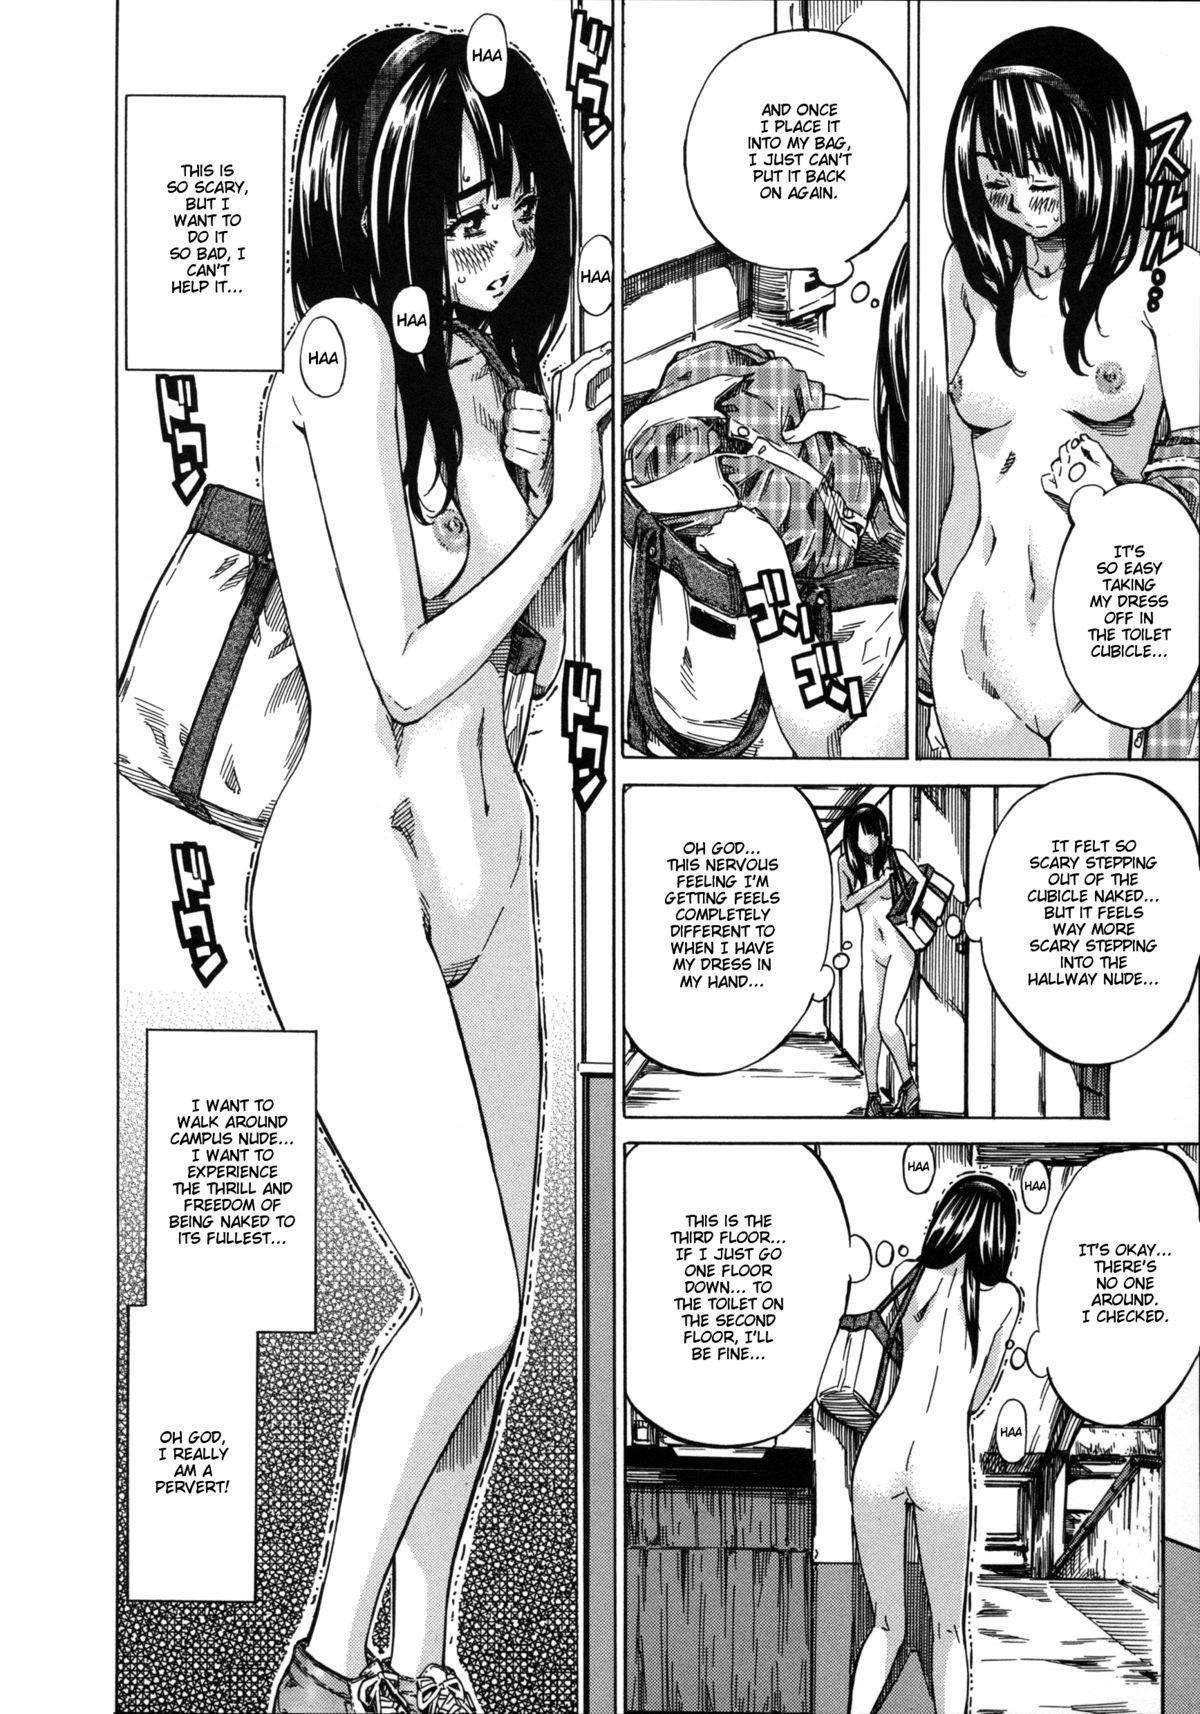 Kashiwazaki Miki wa Ironna Basho de Zenra Sanpo Shitemita | Miki Kashiwazaki Goes Naked in All Sorts of Places 29